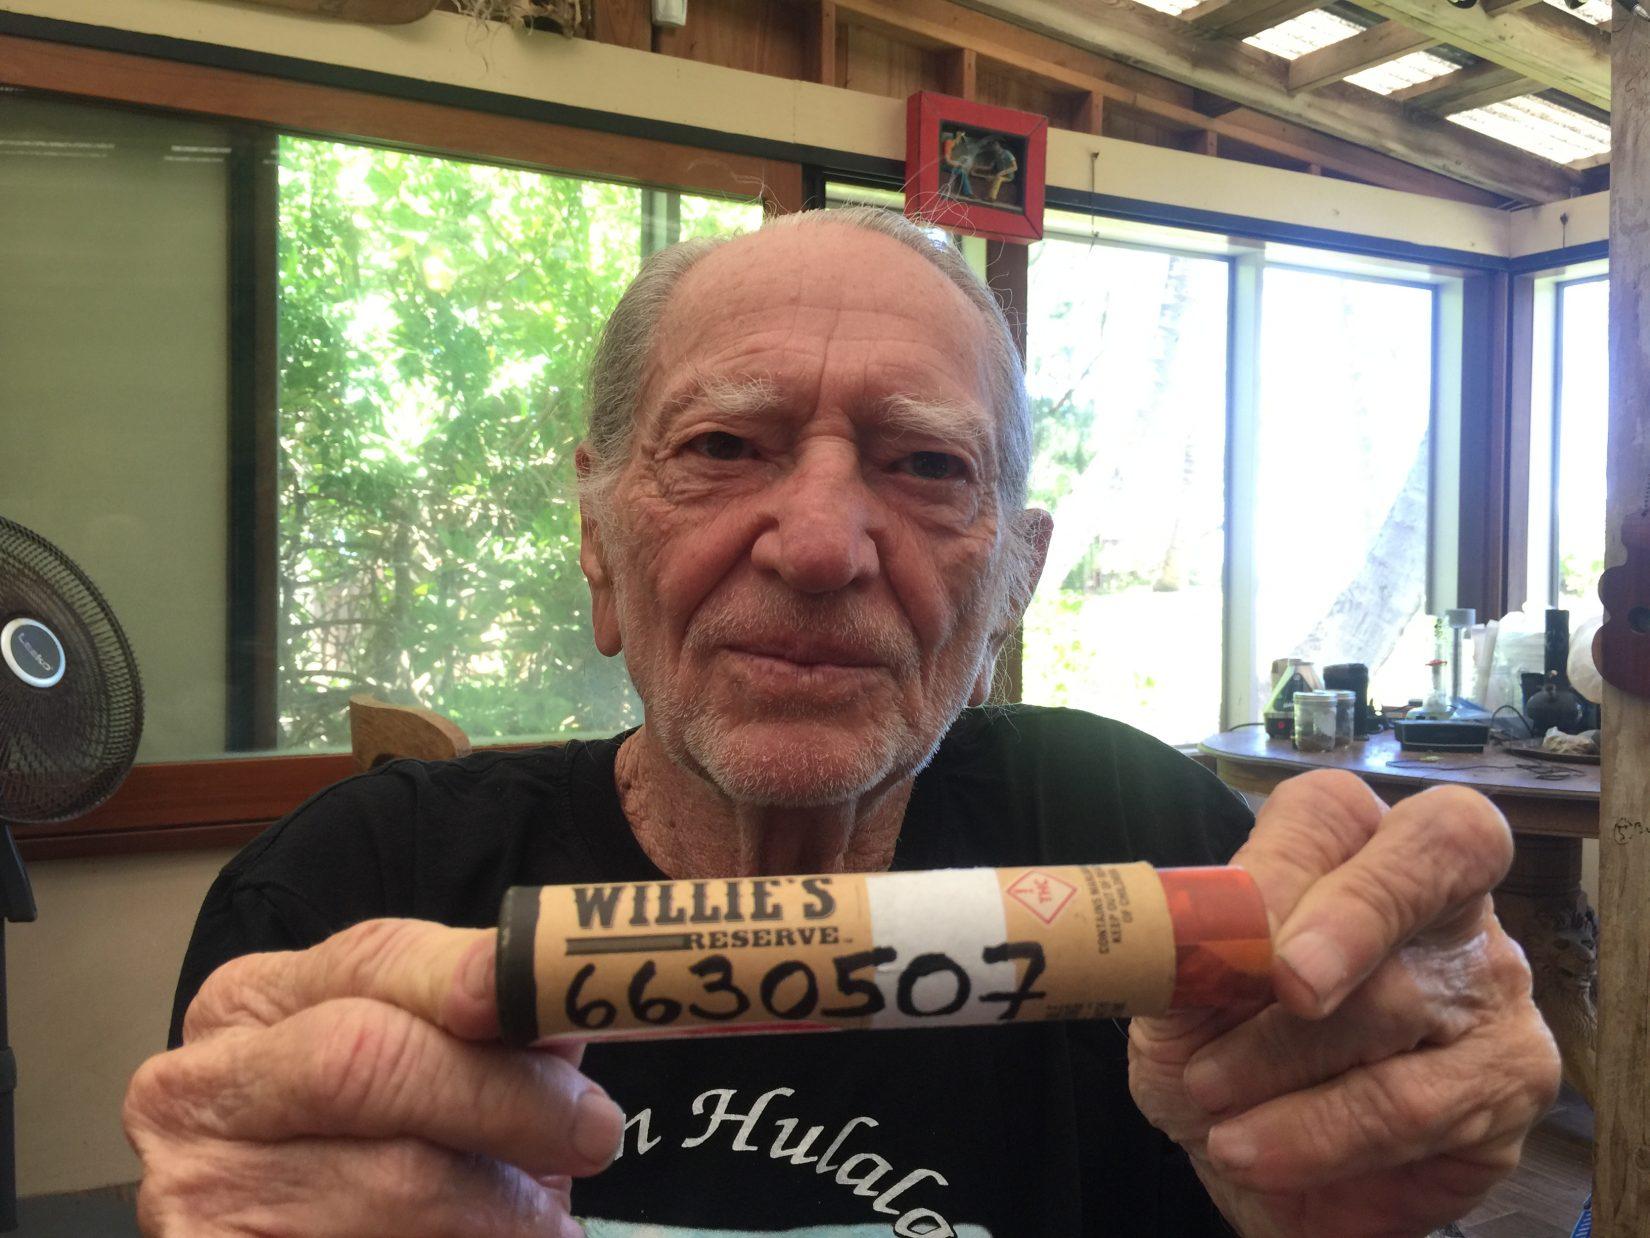 willie pot patent